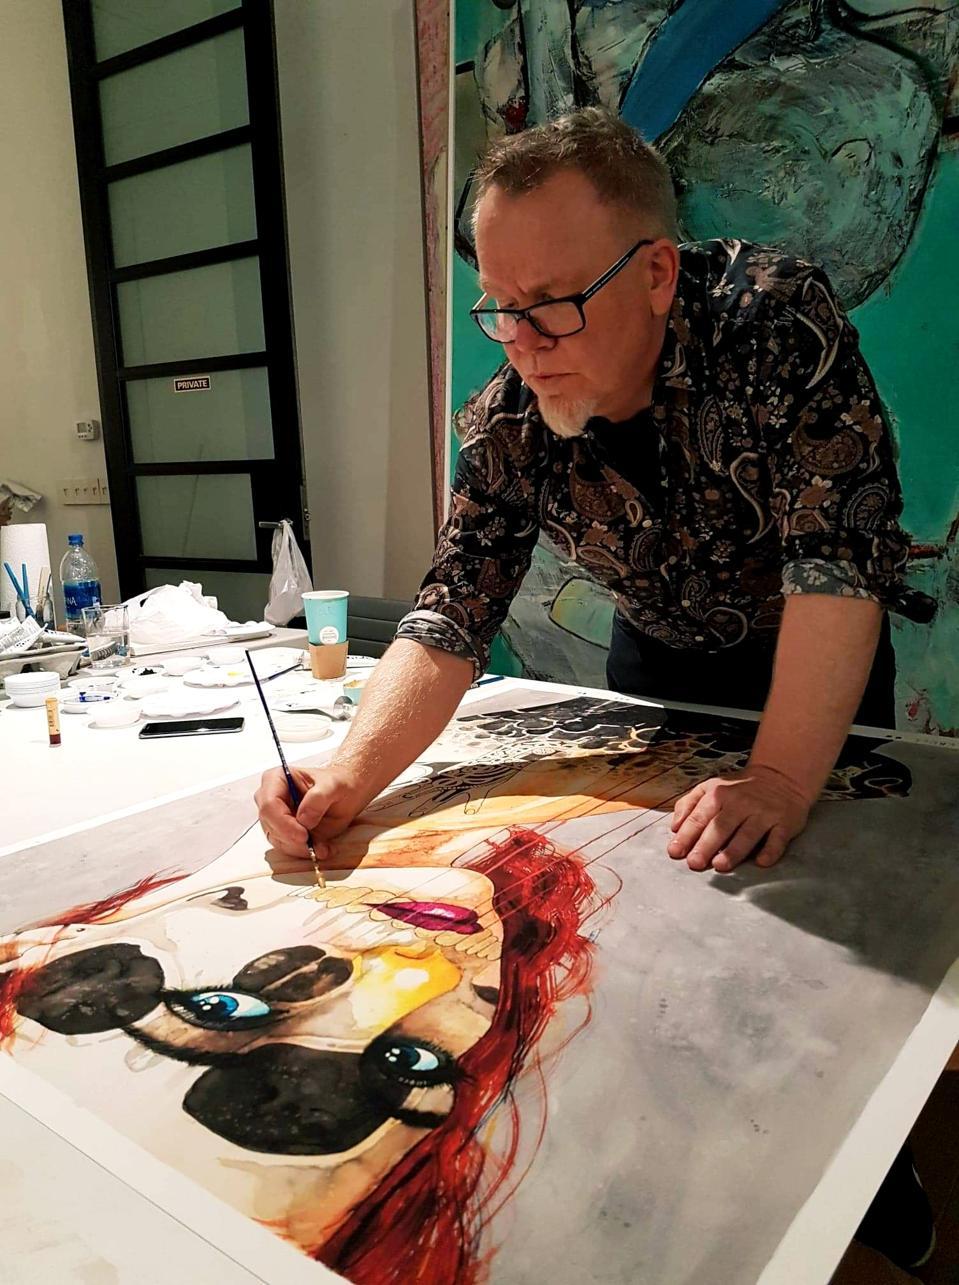 Artist Ole Aakjær works in his studio in Denmark.